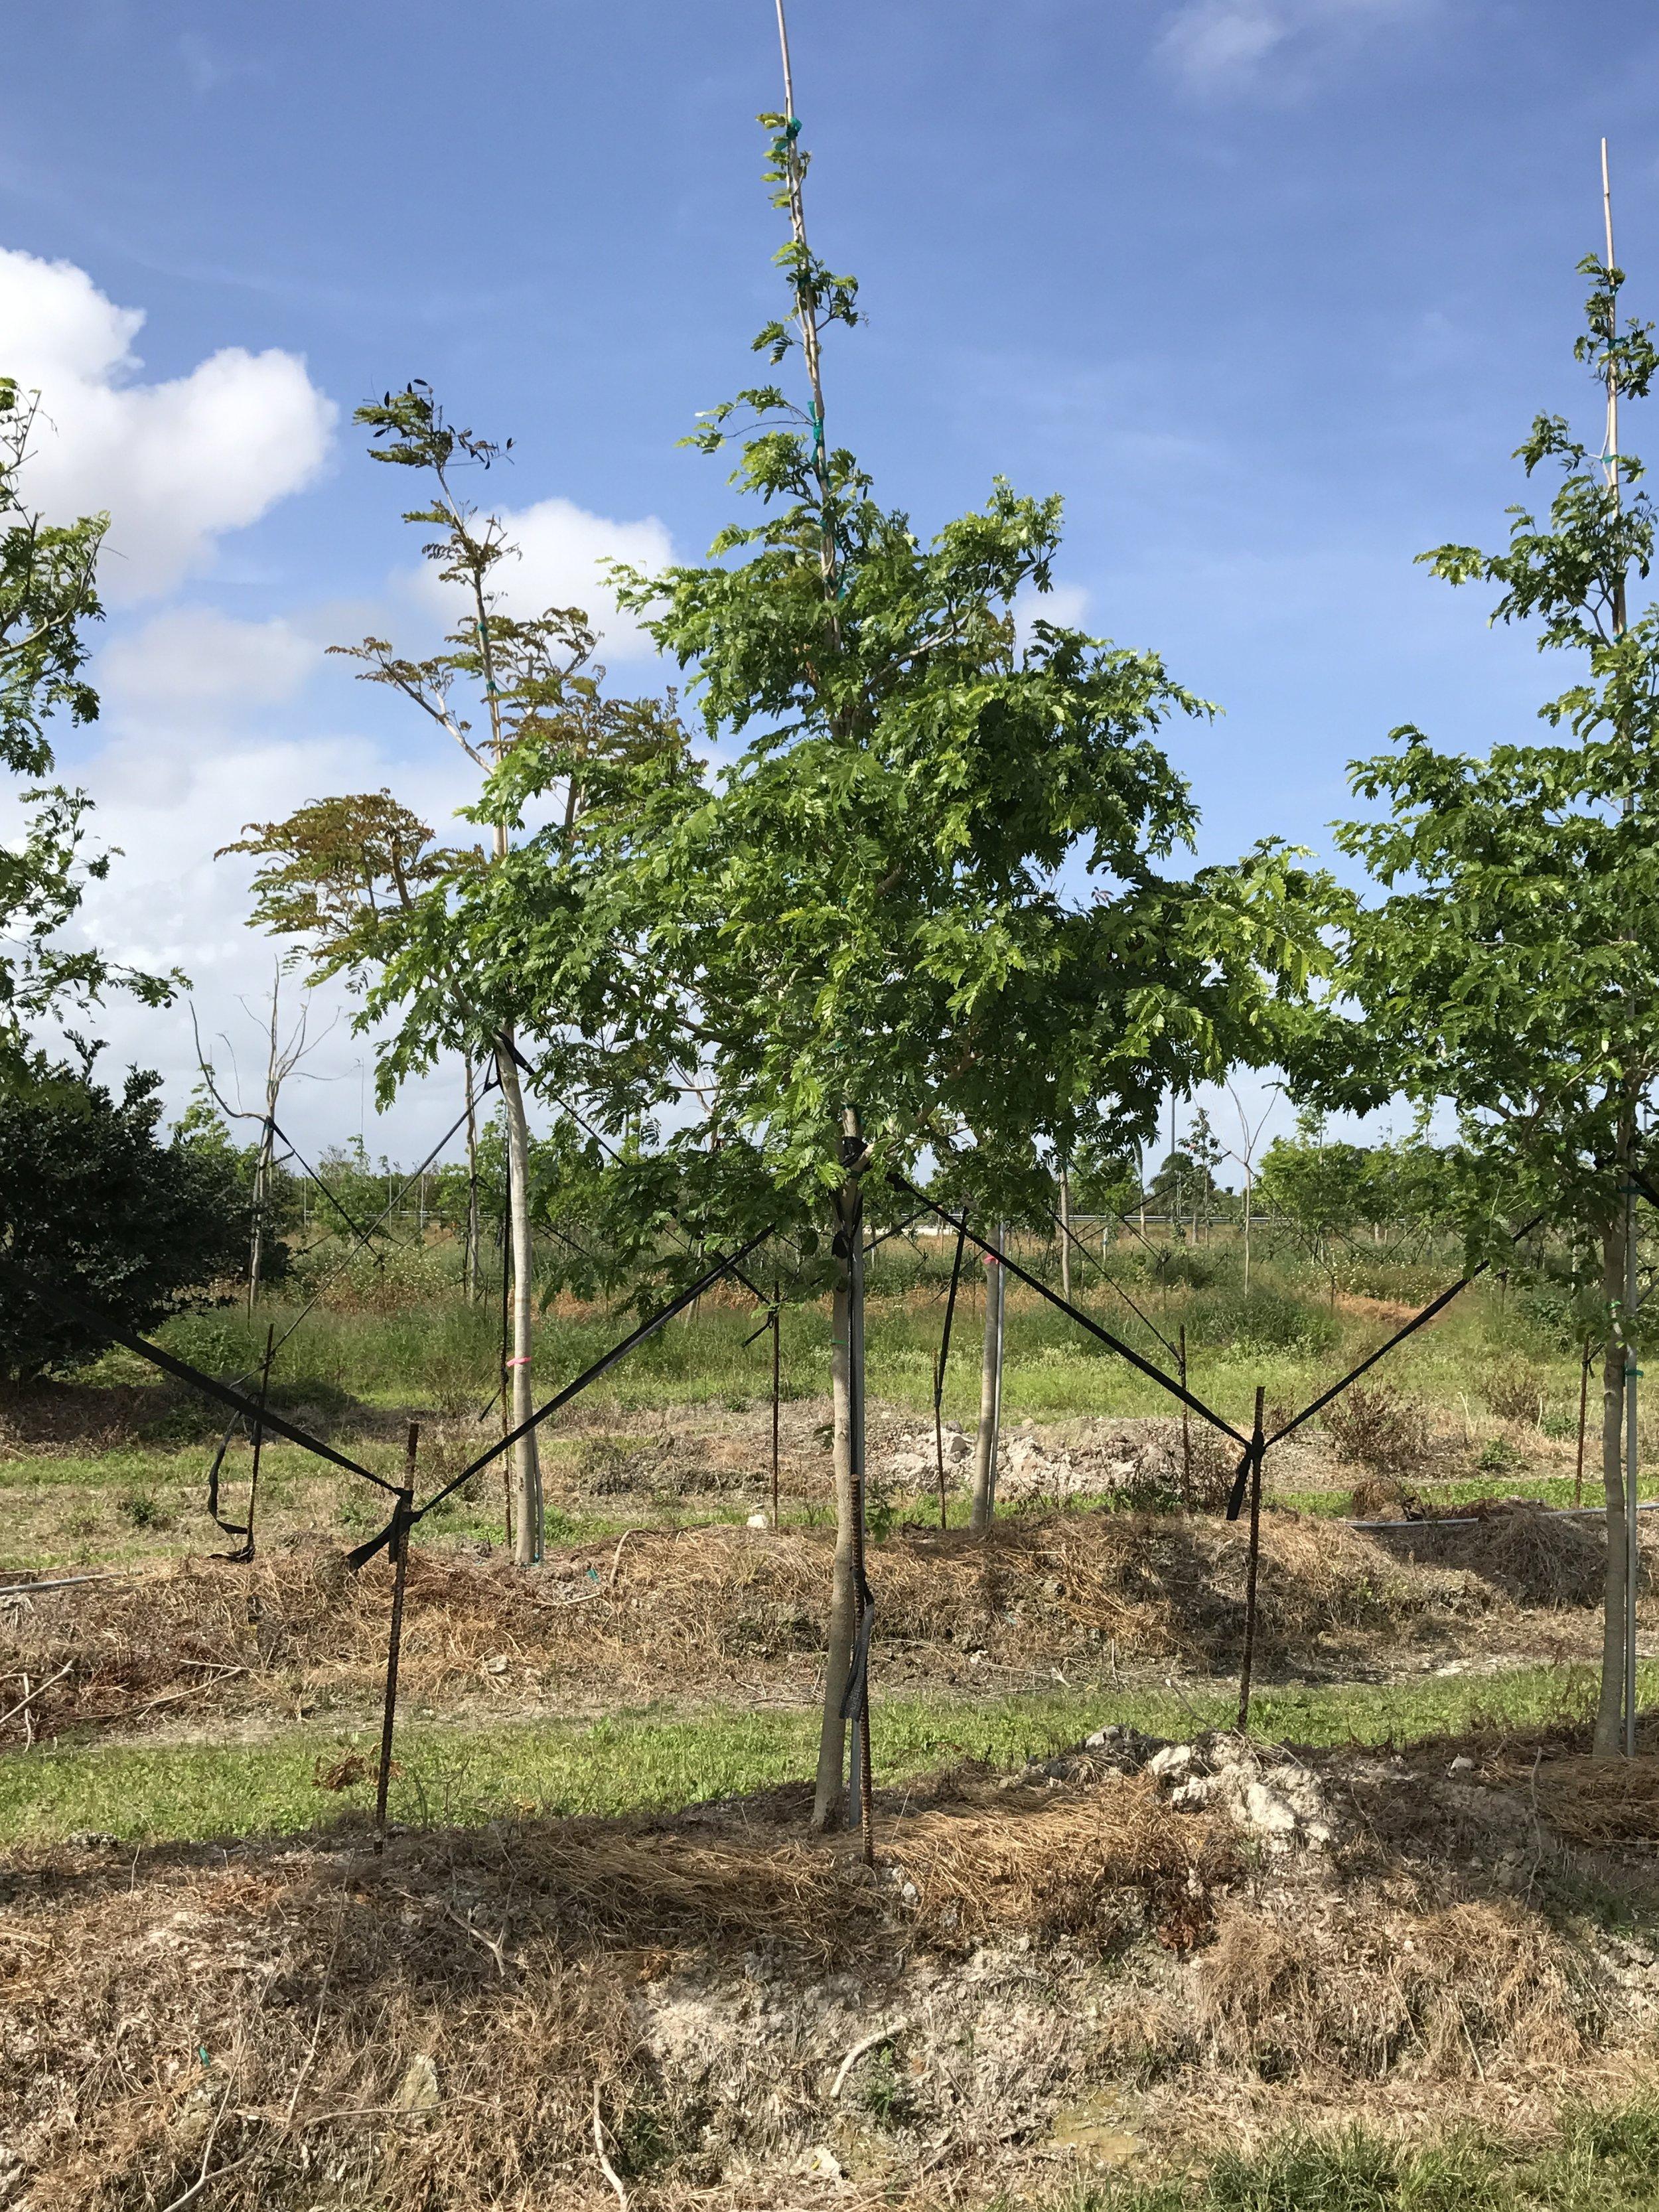 Bulnesia Tree - Field grown in Homestead, Florida